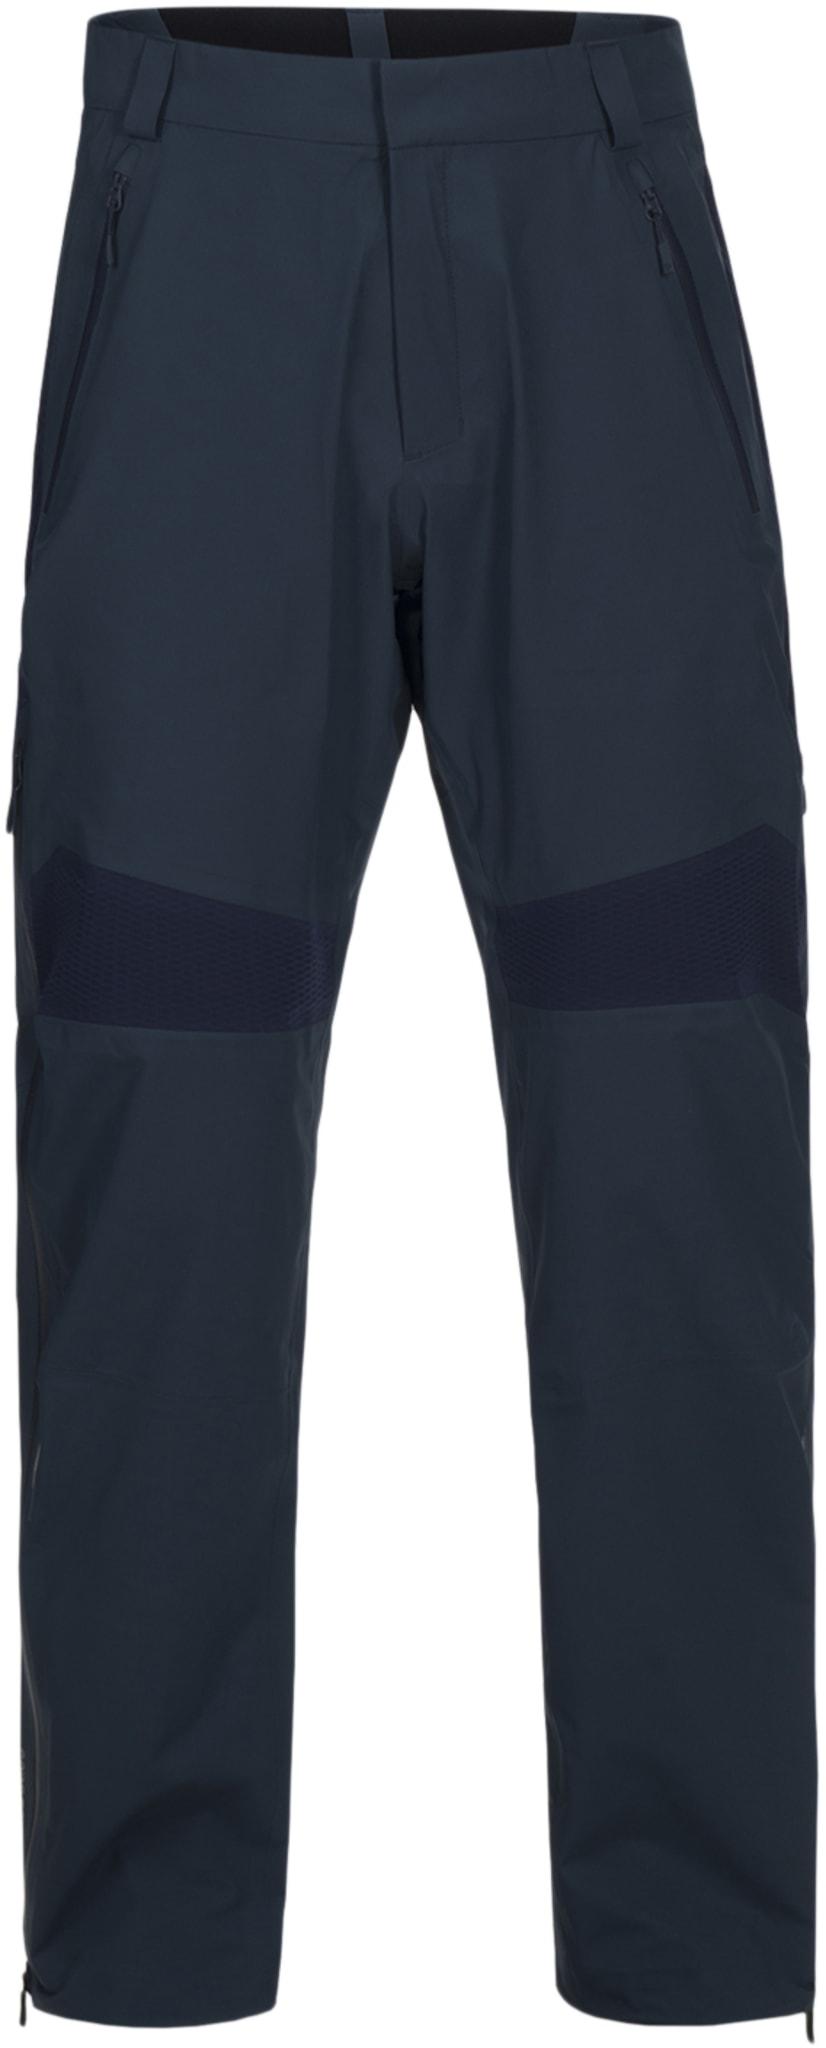 Vislight C Pants